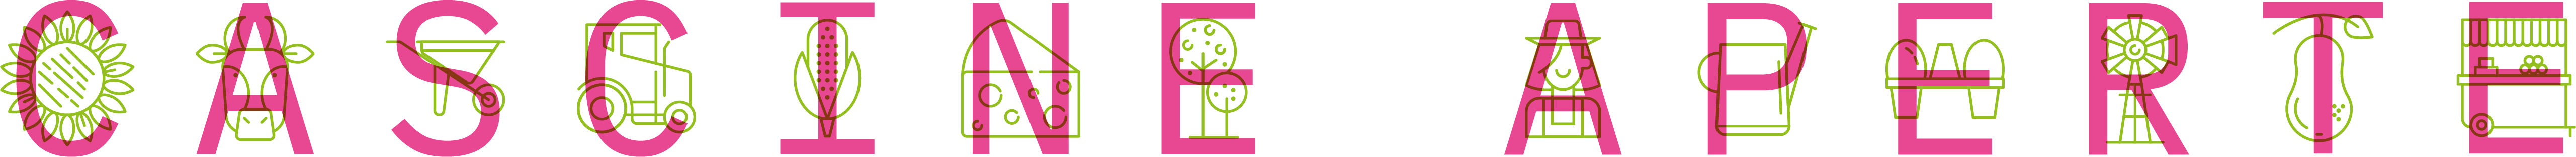 Cascine Aperte Milano Logo